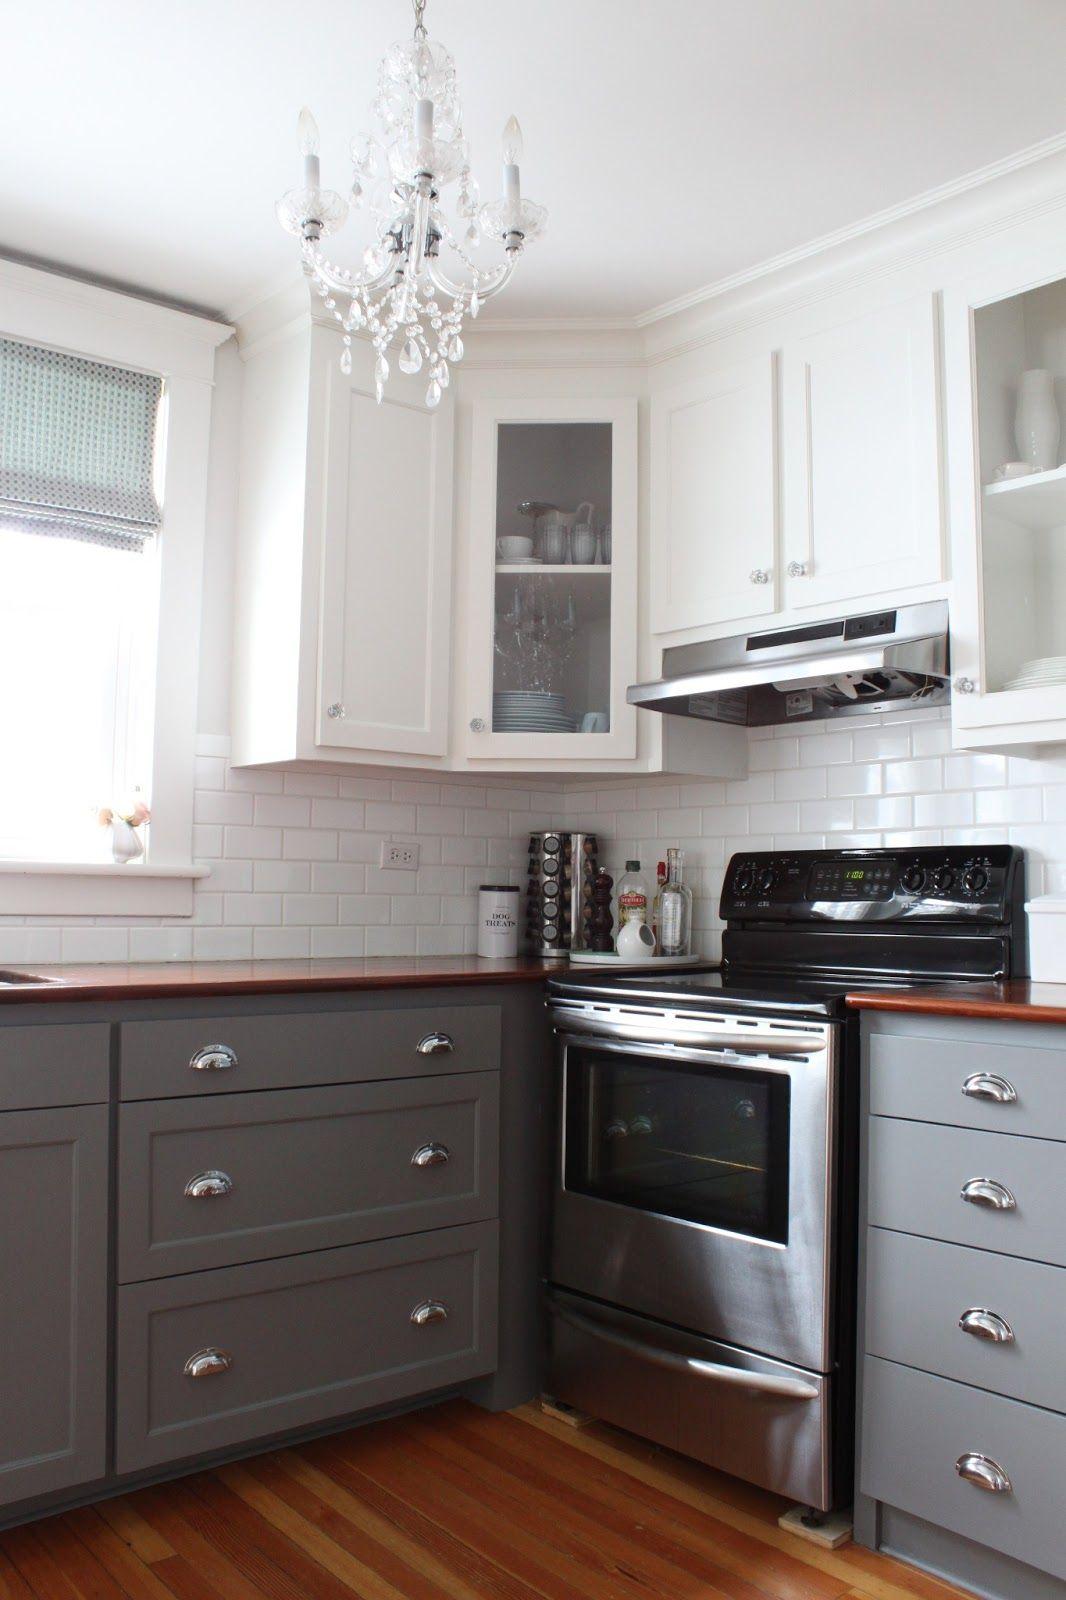 Inspiring Kitchen Storage Ideas With Exciting Two Tone Kitchen